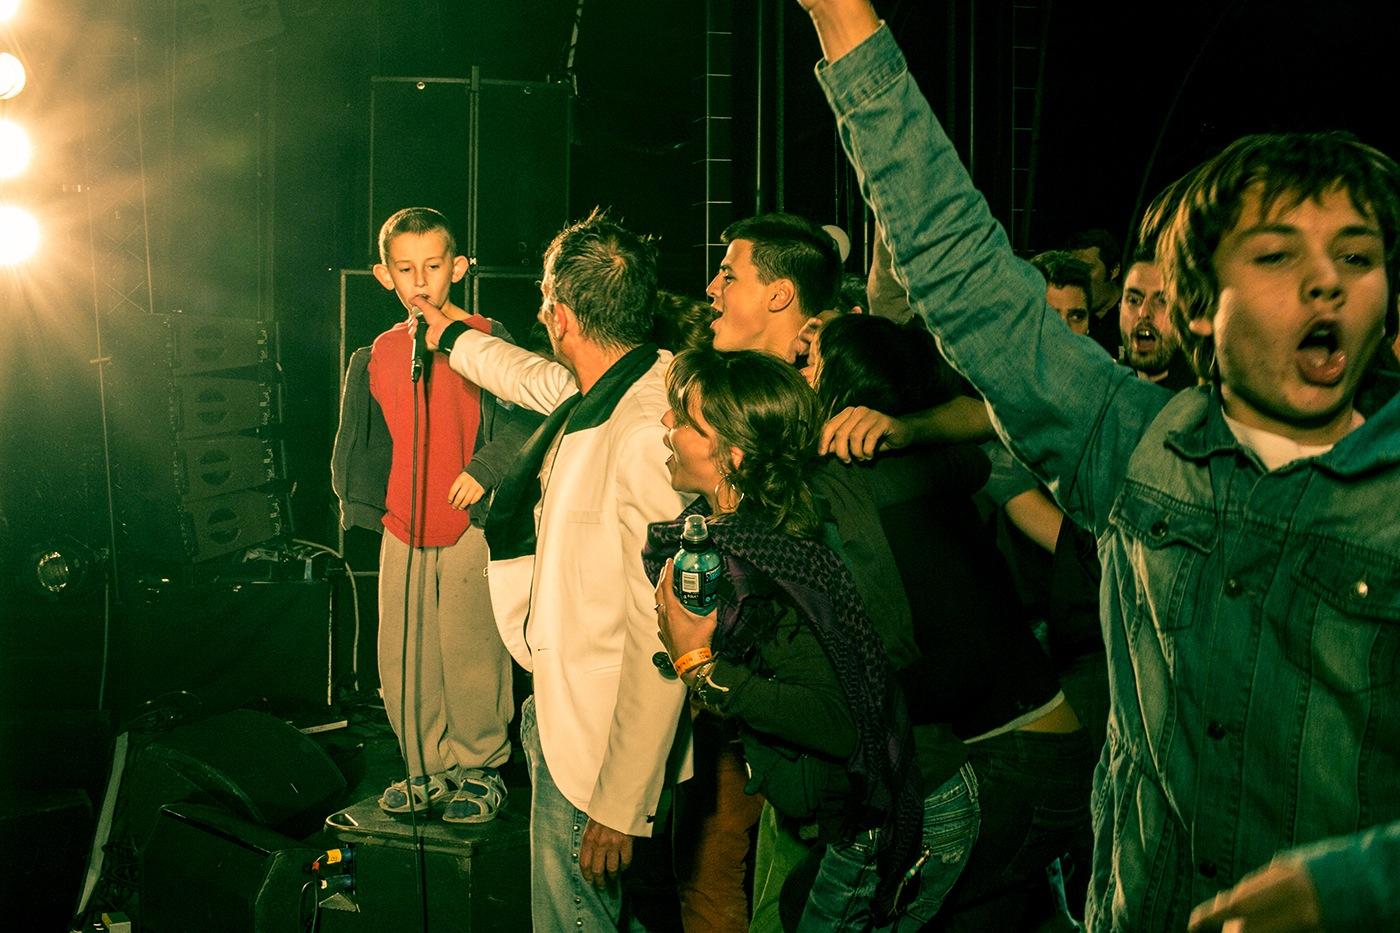 photographe-reportage-festival-rockadel-guillaume-heraud-048-small